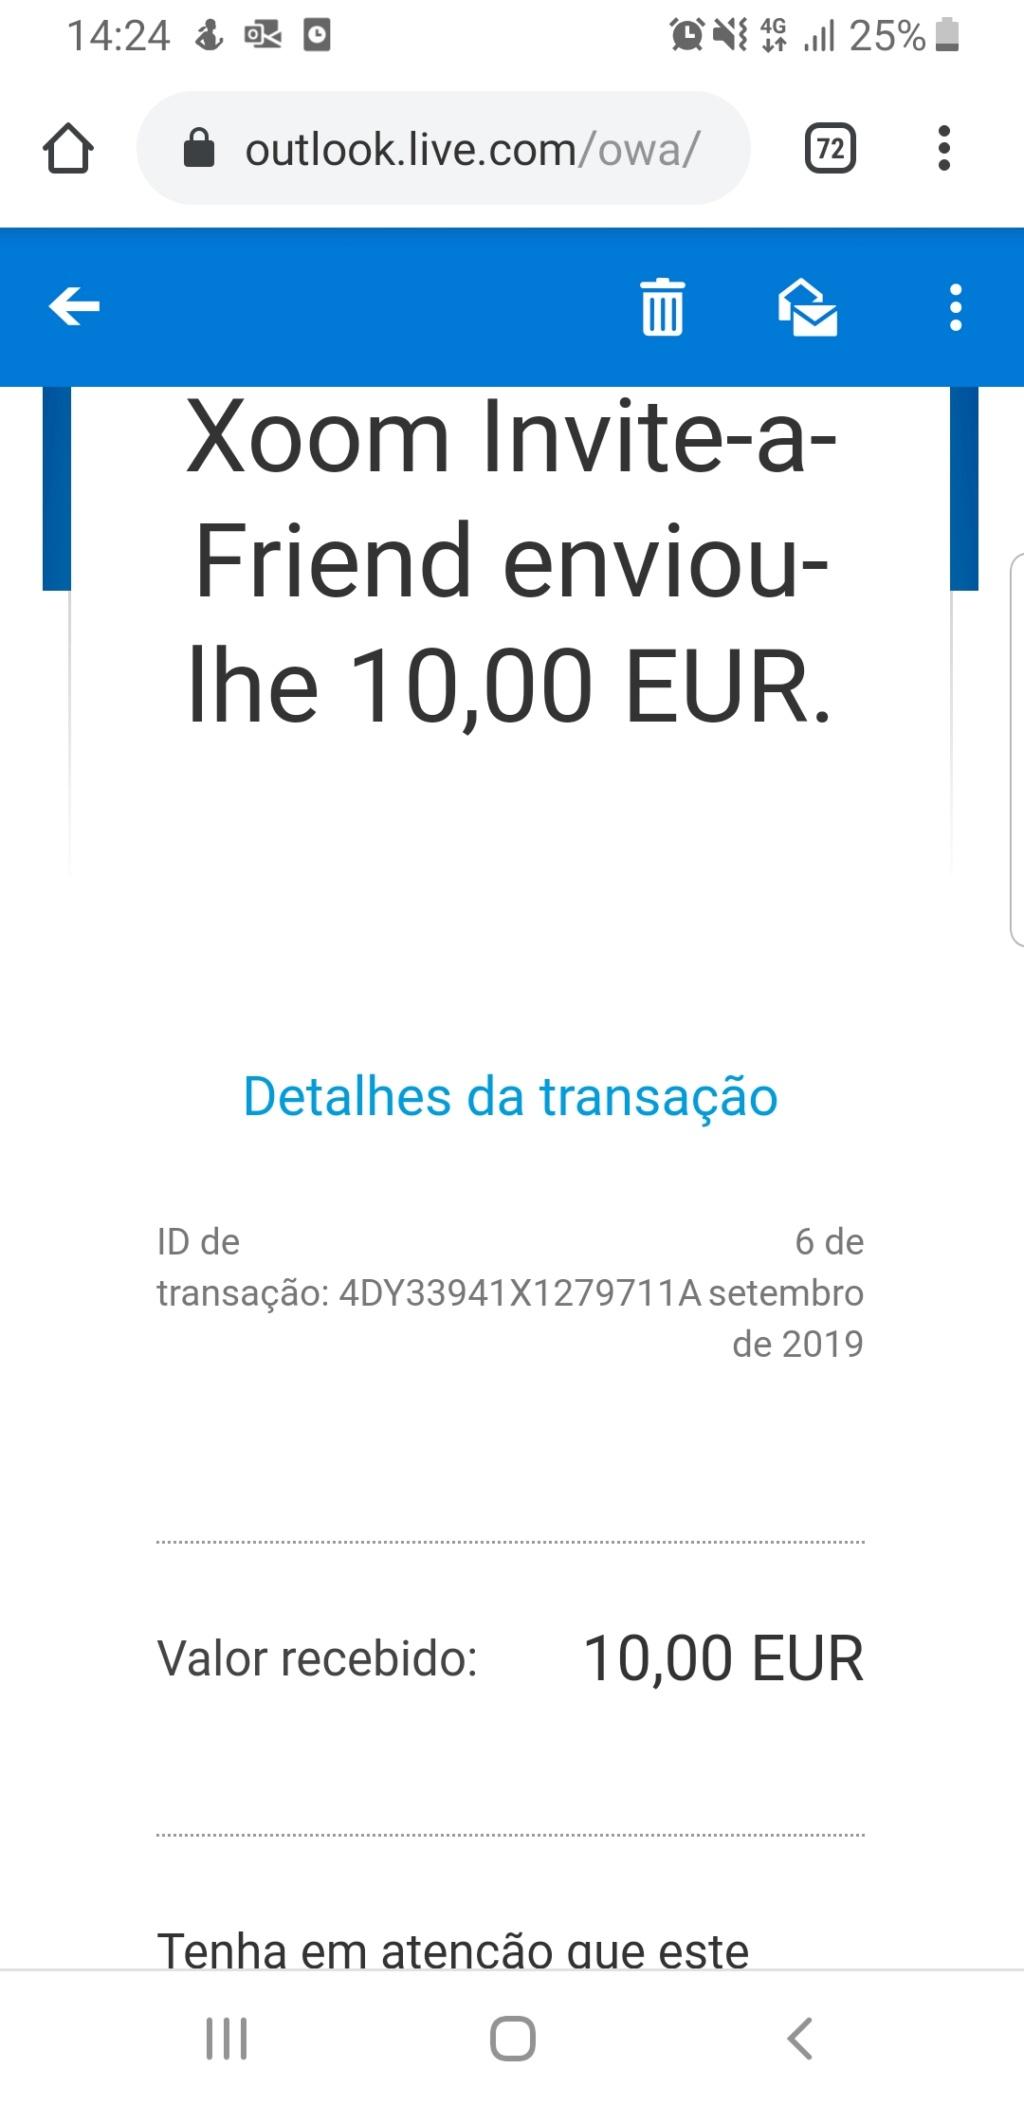 OPORTUNIDADE [Provado] - Ganha 25€ Paypal por registar na Xoom (empresaPaypal) Screen10